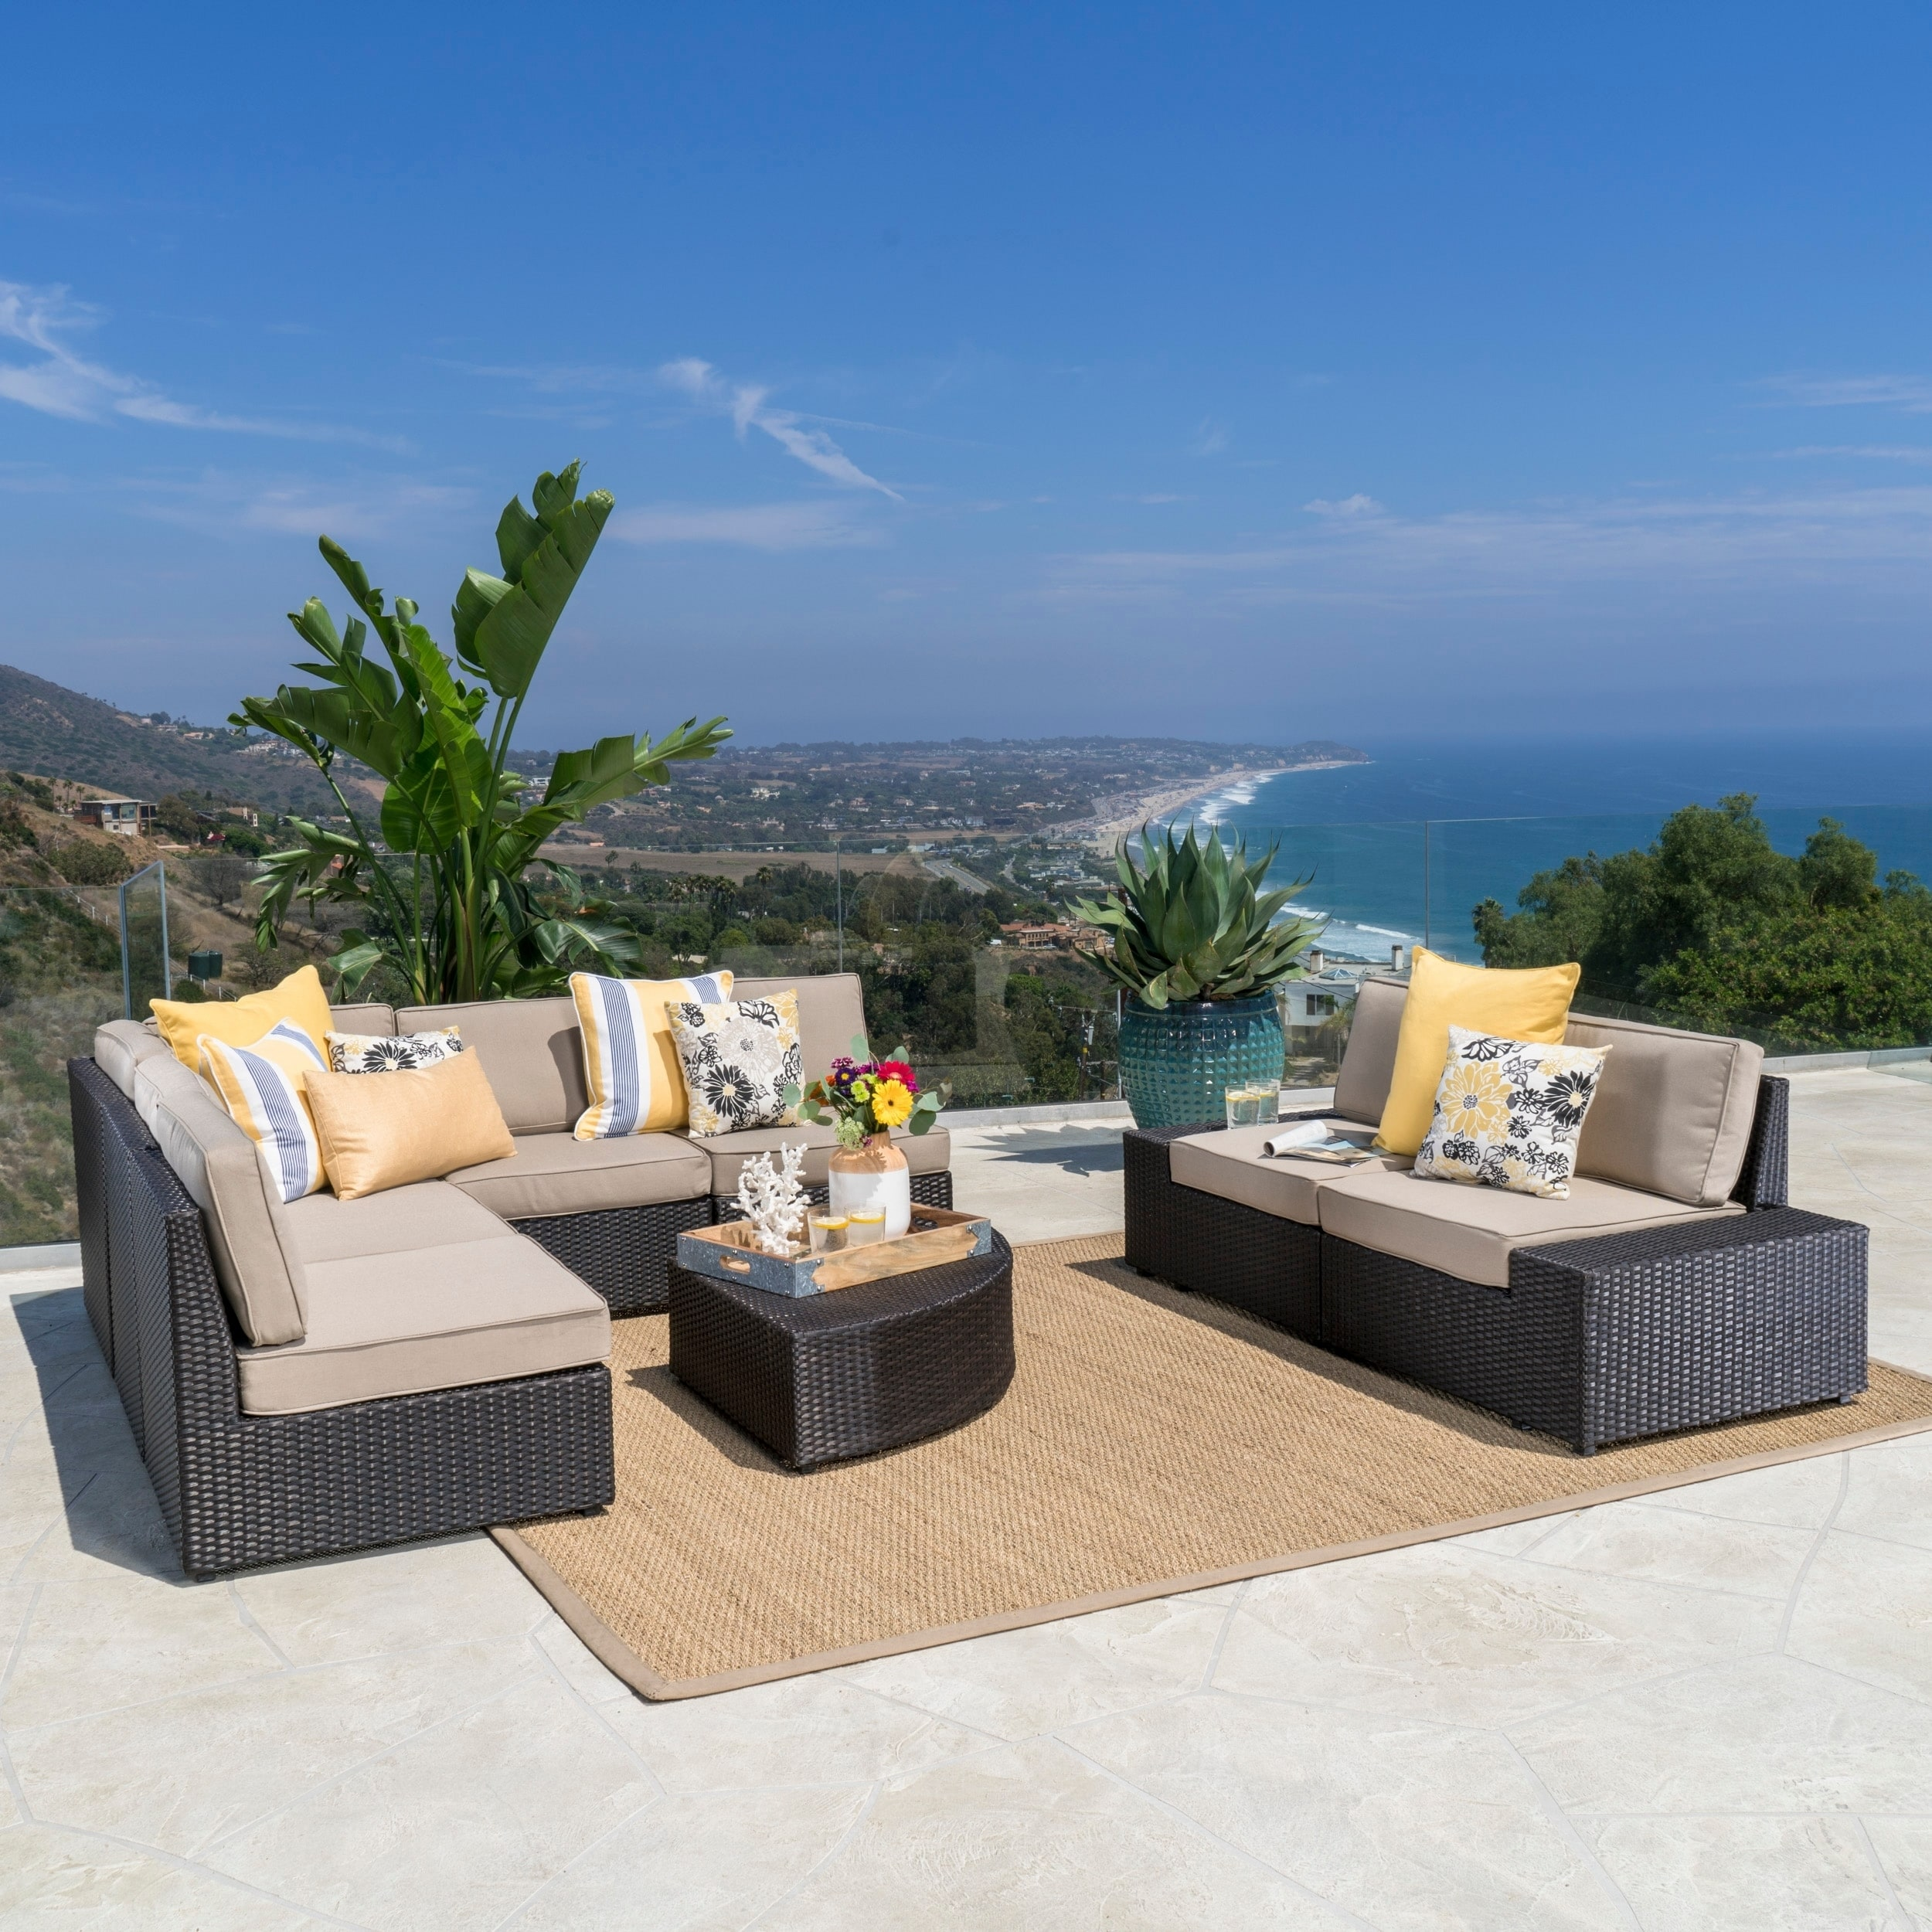 Outdoor 8 Piece Wicker Sofa Set